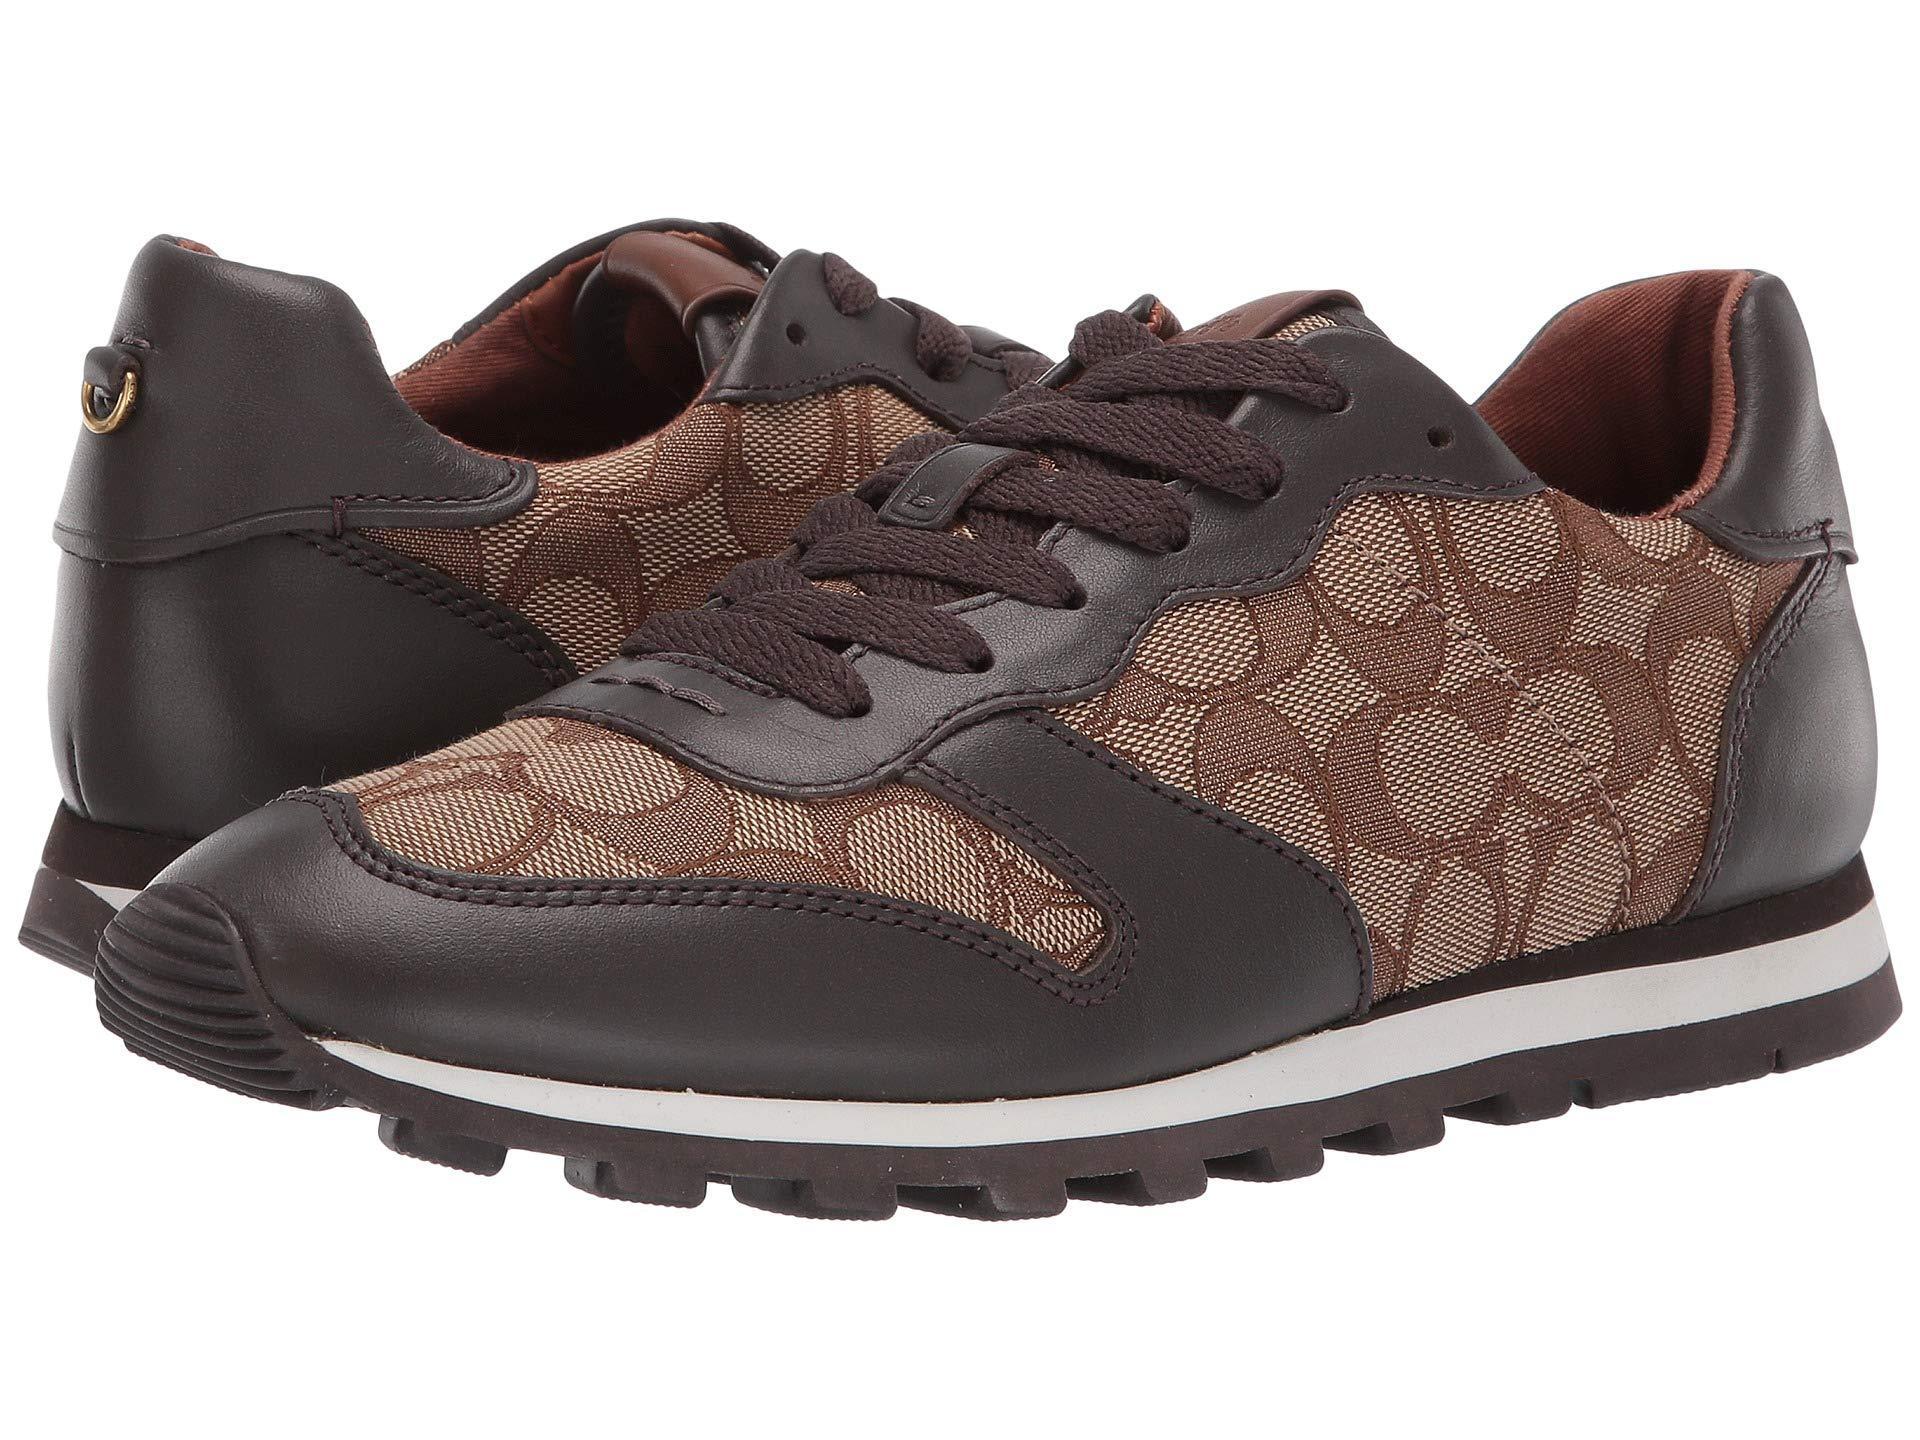 SmokeblackWomen's Lyst Cblack C125 Coach Signature Shoes Runner XZOiuPk